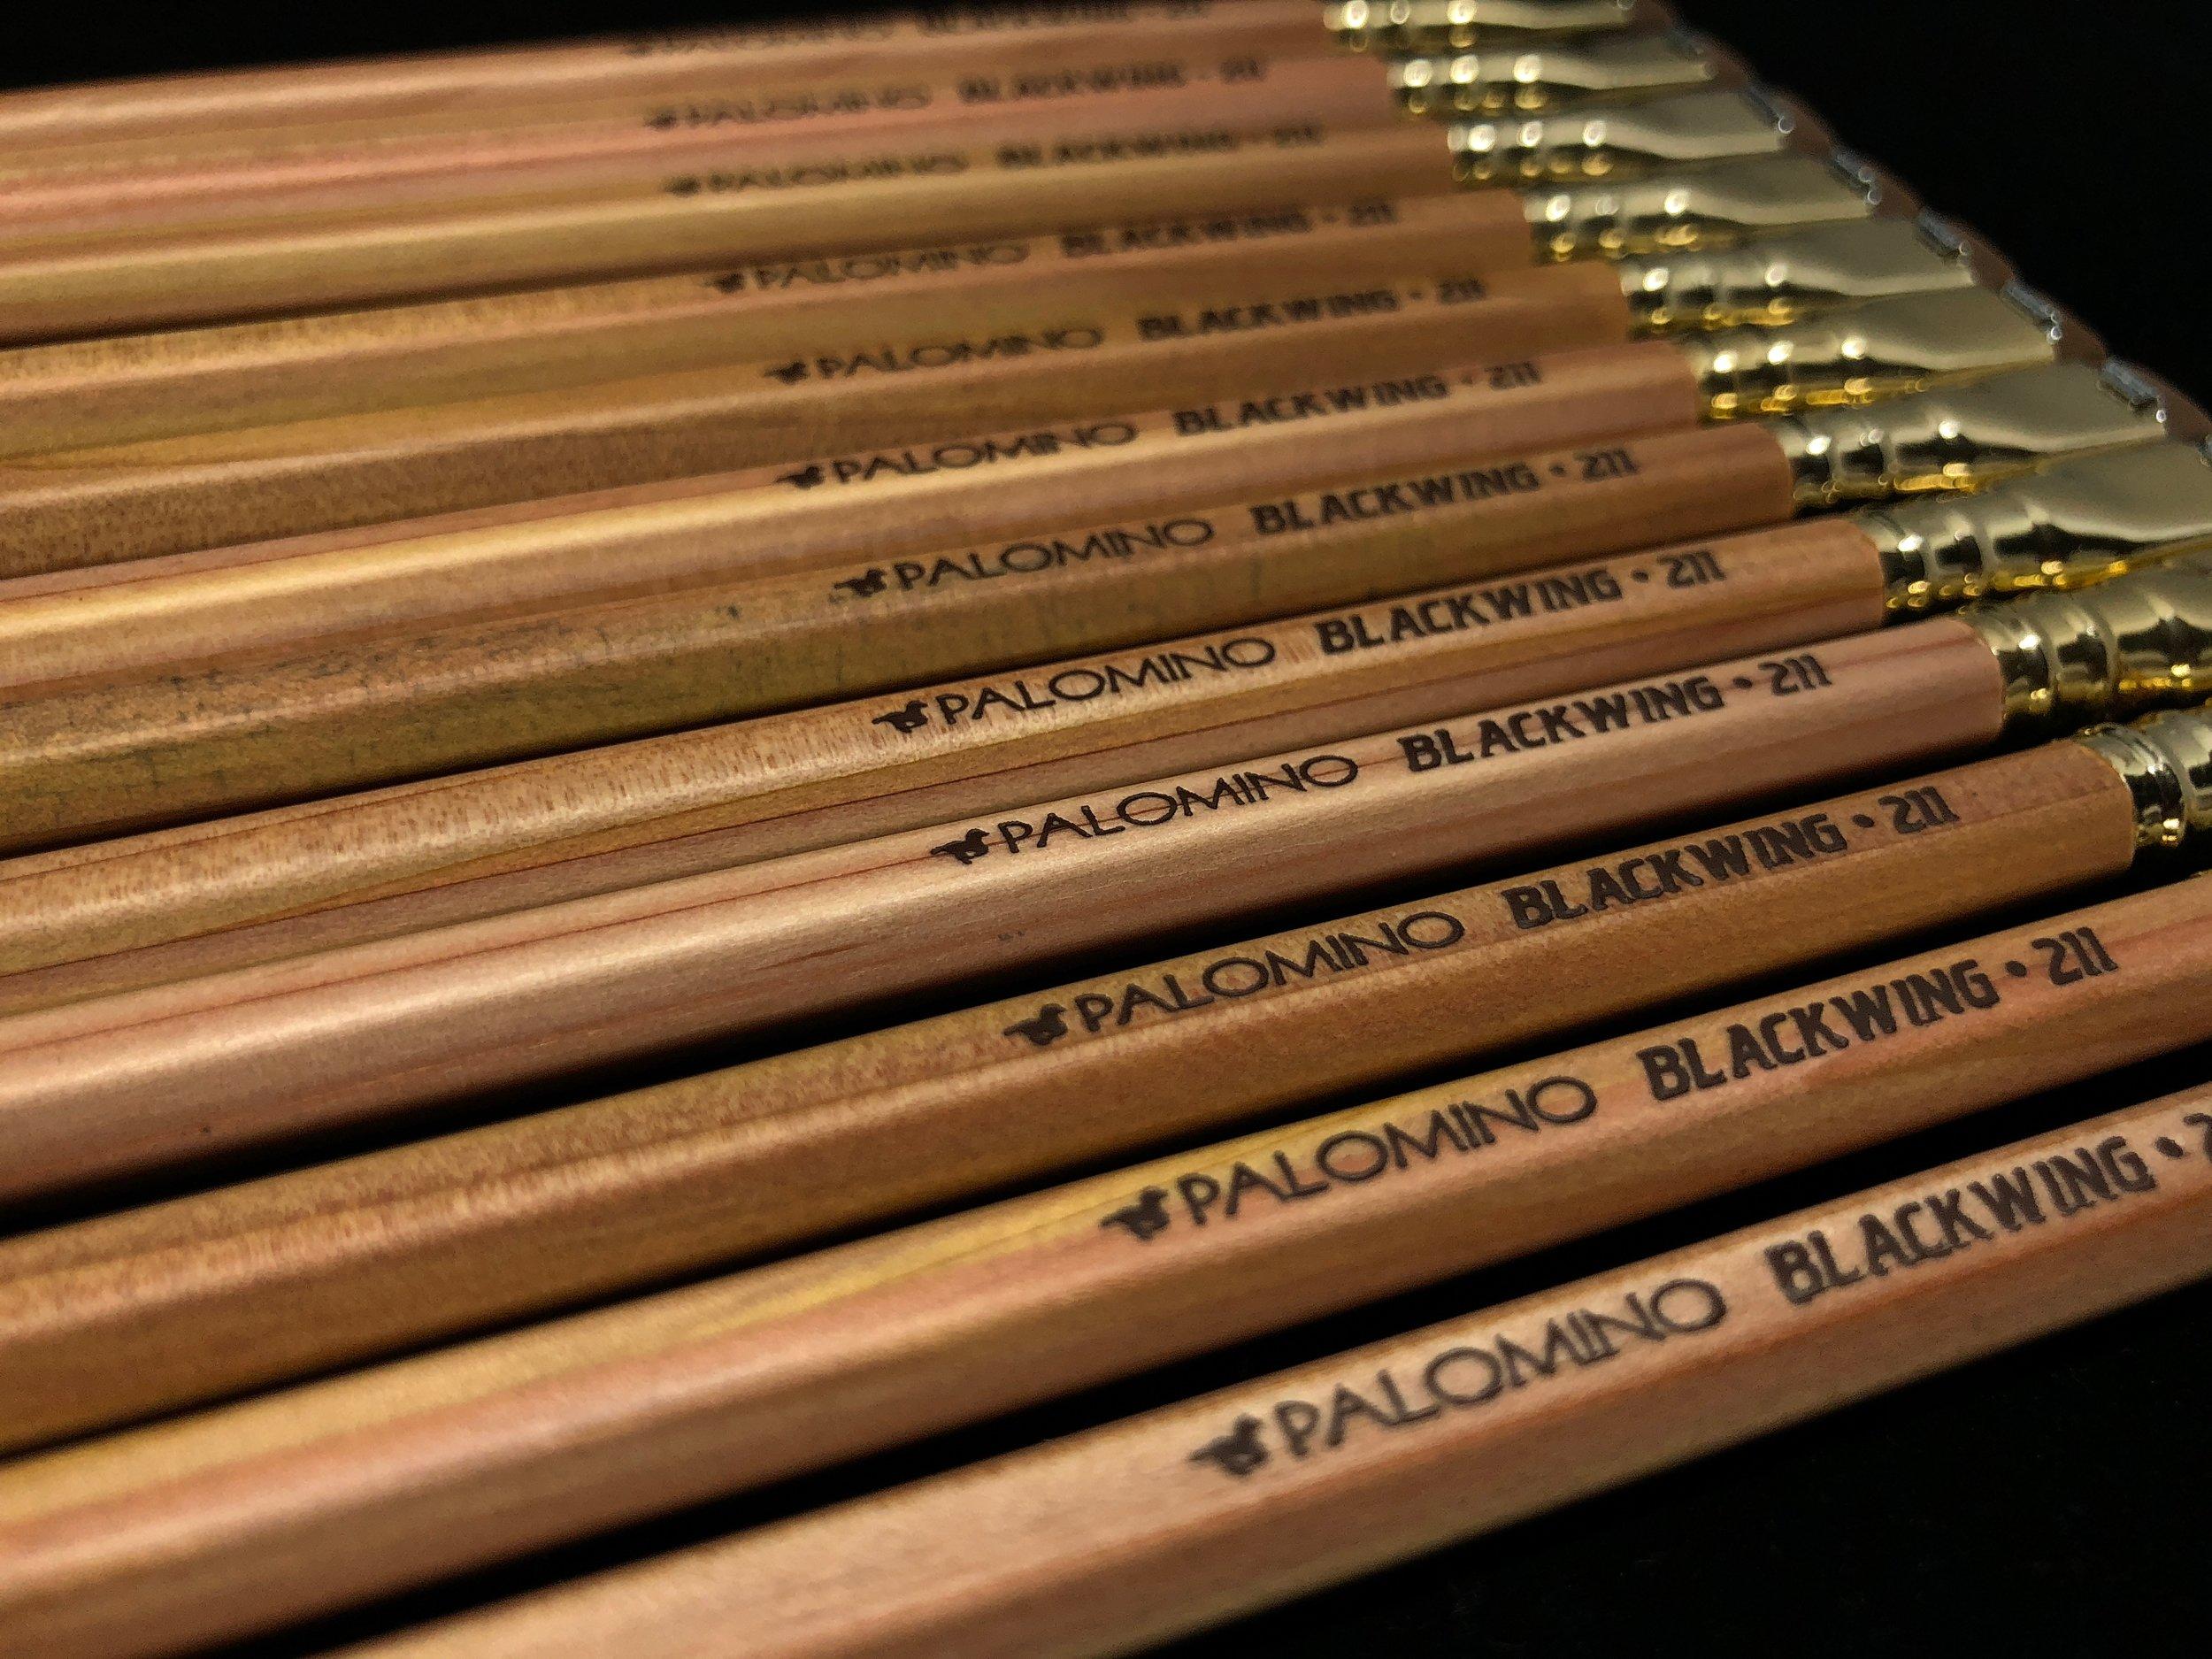 palomino-blackwing-211-pencil-6.jpg